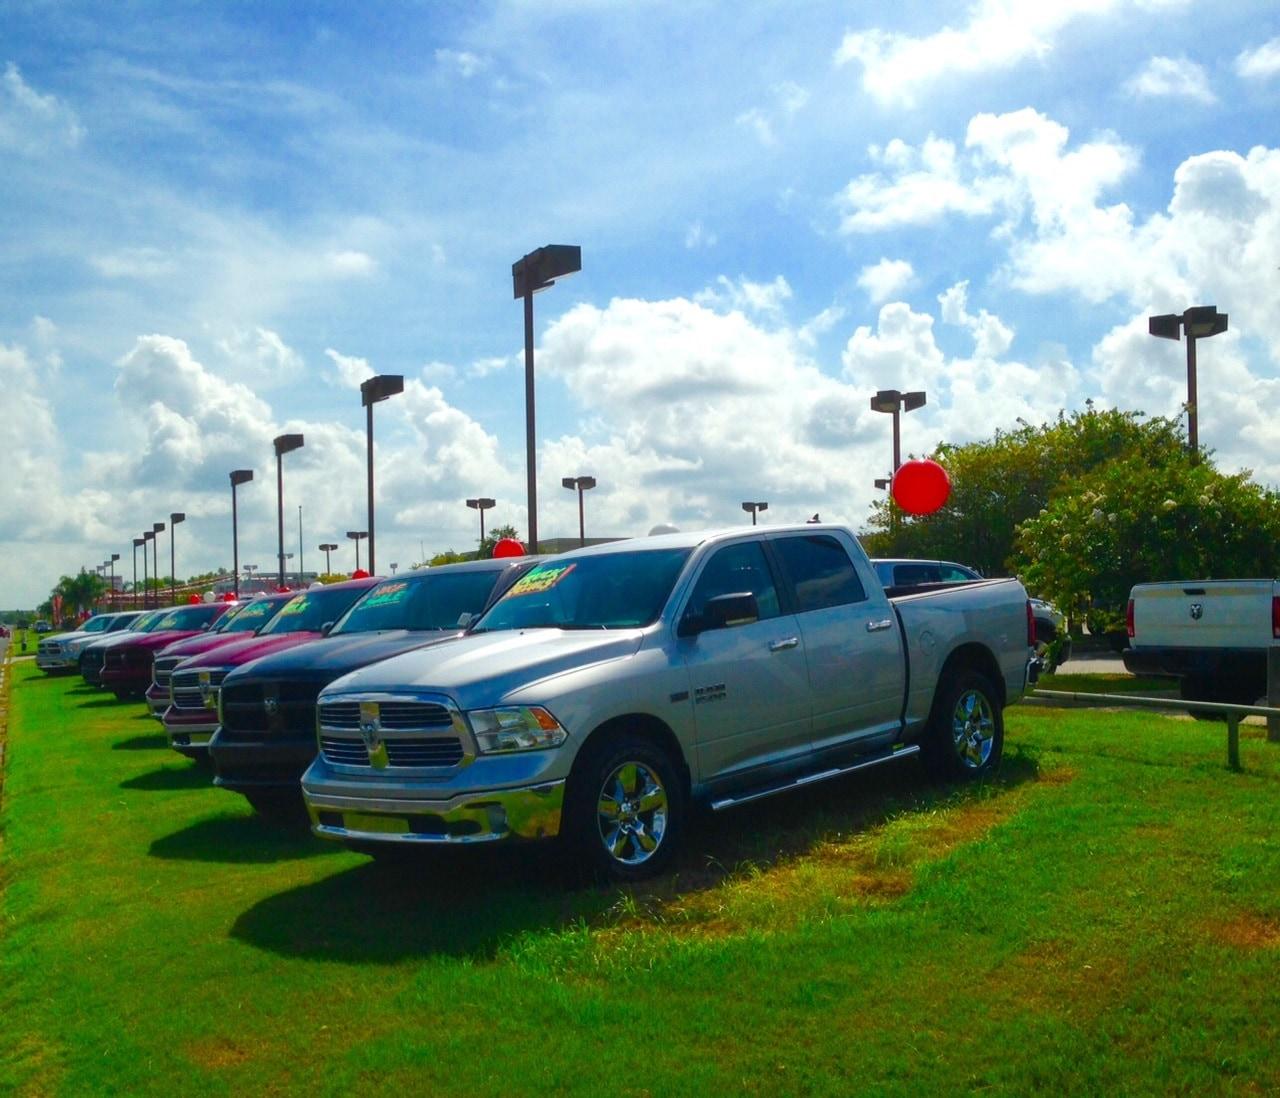 Contact Premier Chrysler Jeep Dodge Ram